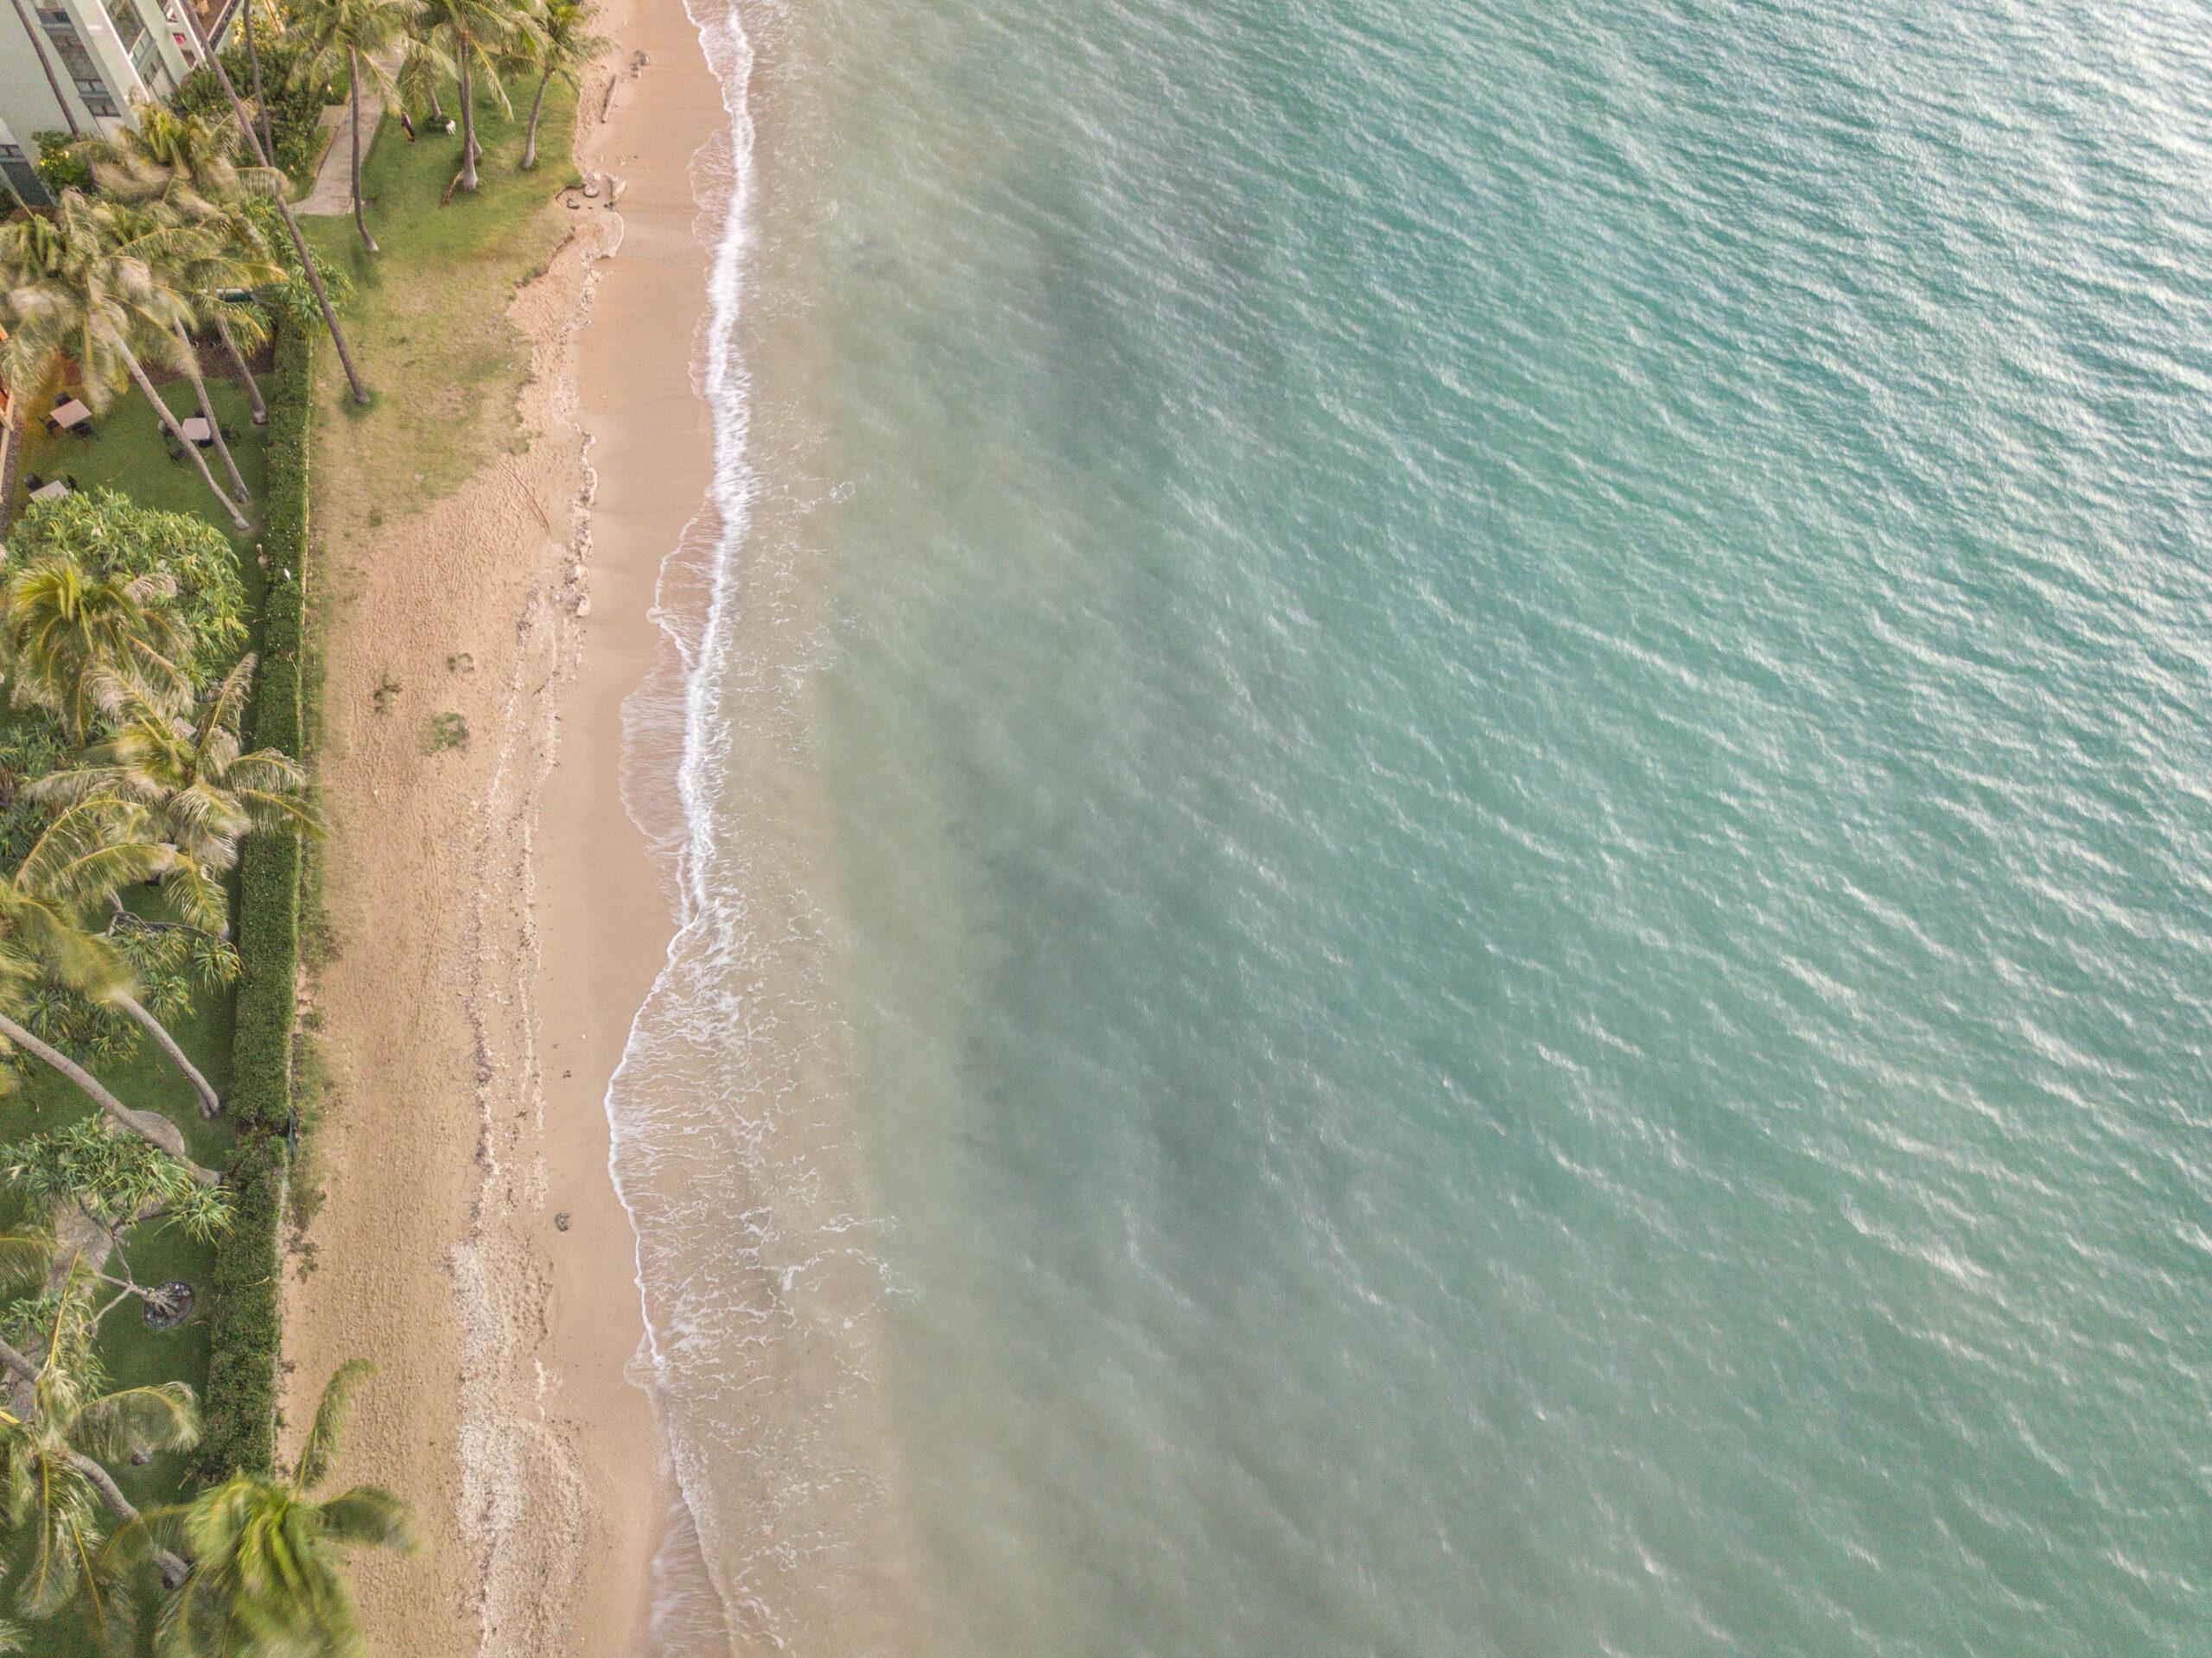 Hawaii Photos: The Kahala - In need of a tropical escape? Sharing a photo diary of the Kahala Resort and surrounding beaches on Oahu, Hawaii!   Kahala Hotel - Kahala Resort - Kahala Hawaii - Waialae-Kahala